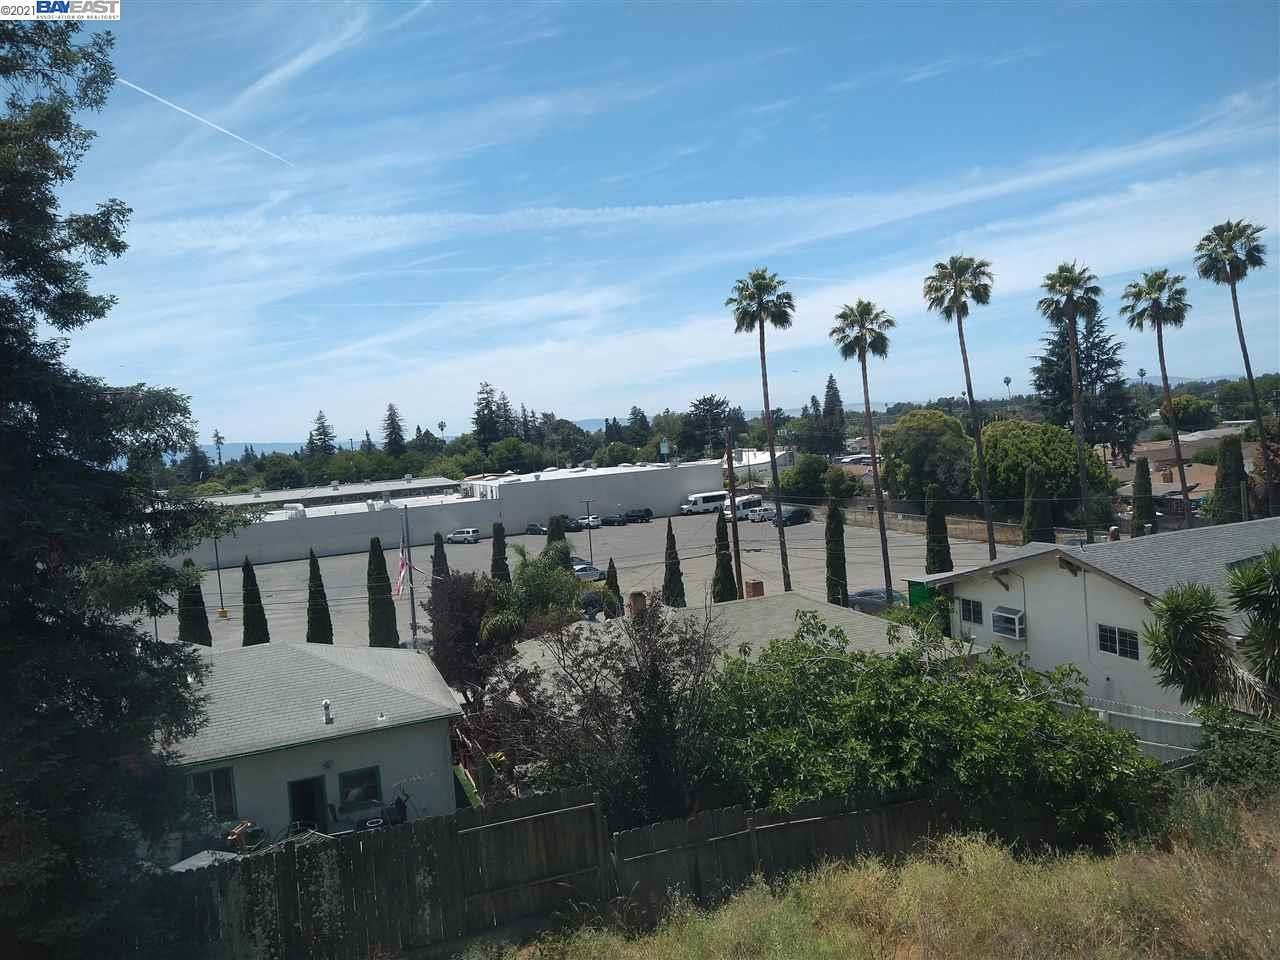 Photo of 1204 Scenic Way, HAYWARD, CA 94541 (MLS # 40954584)